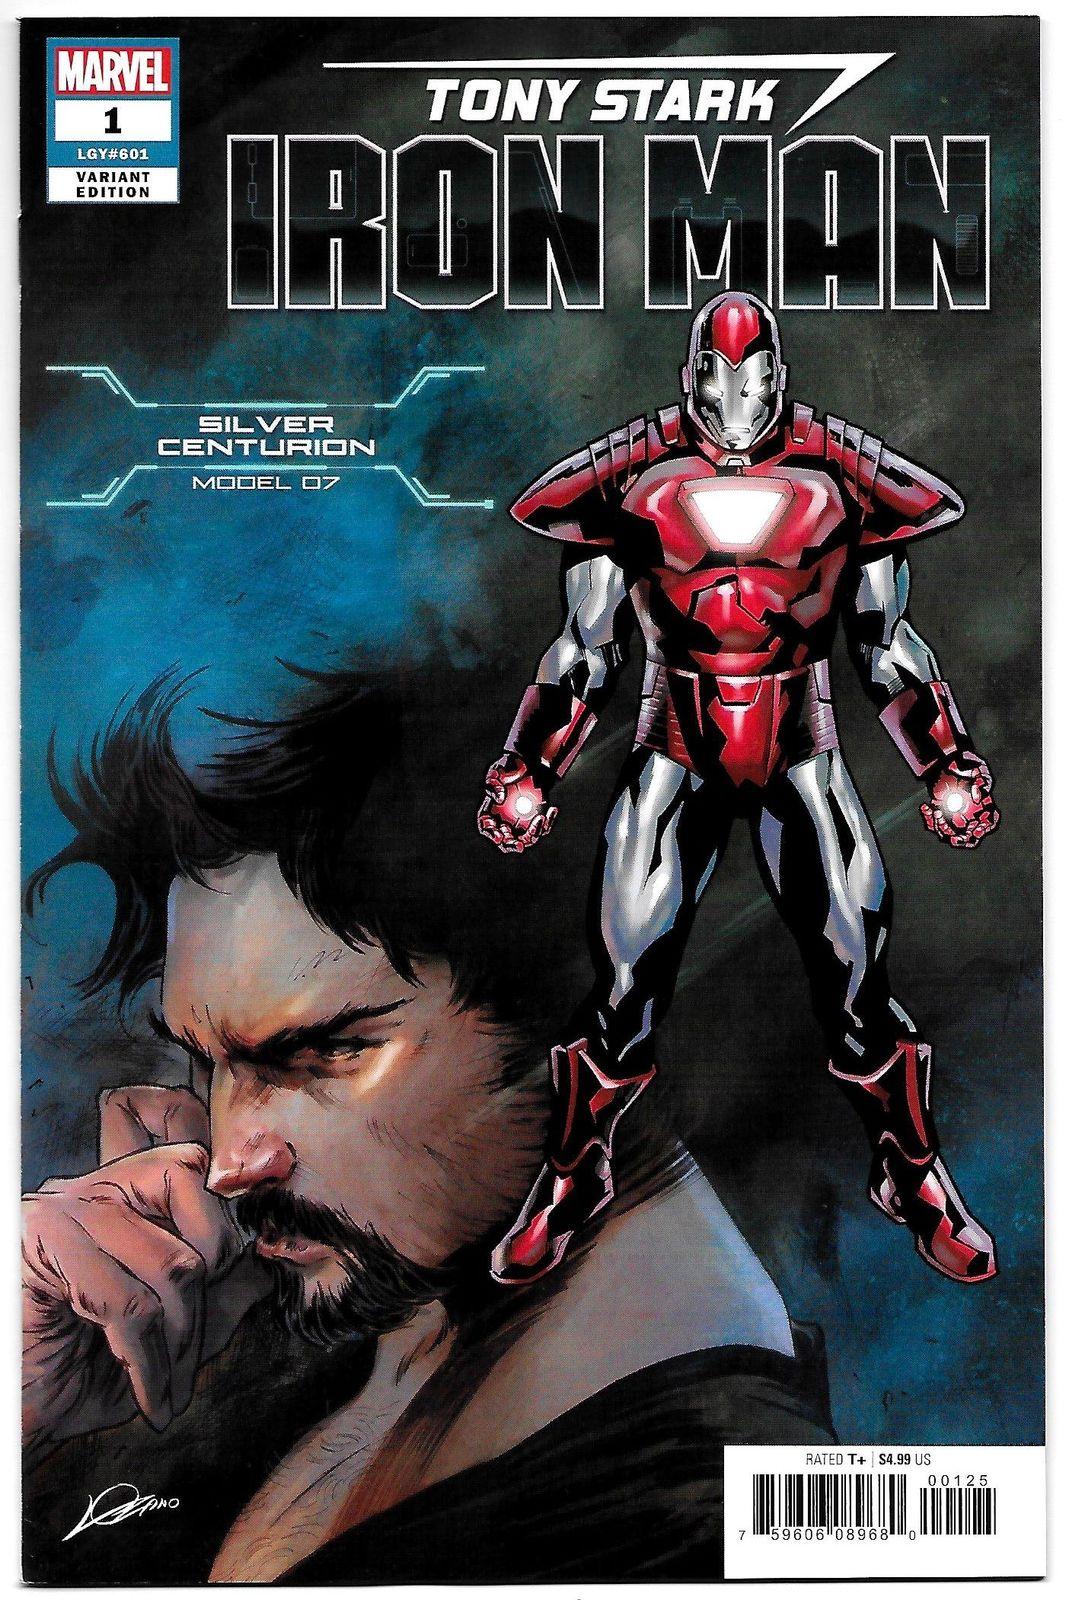 f6f840234d68 Tony Stark Iron Man  1 Silver Centurion Armor Variant (Marvel